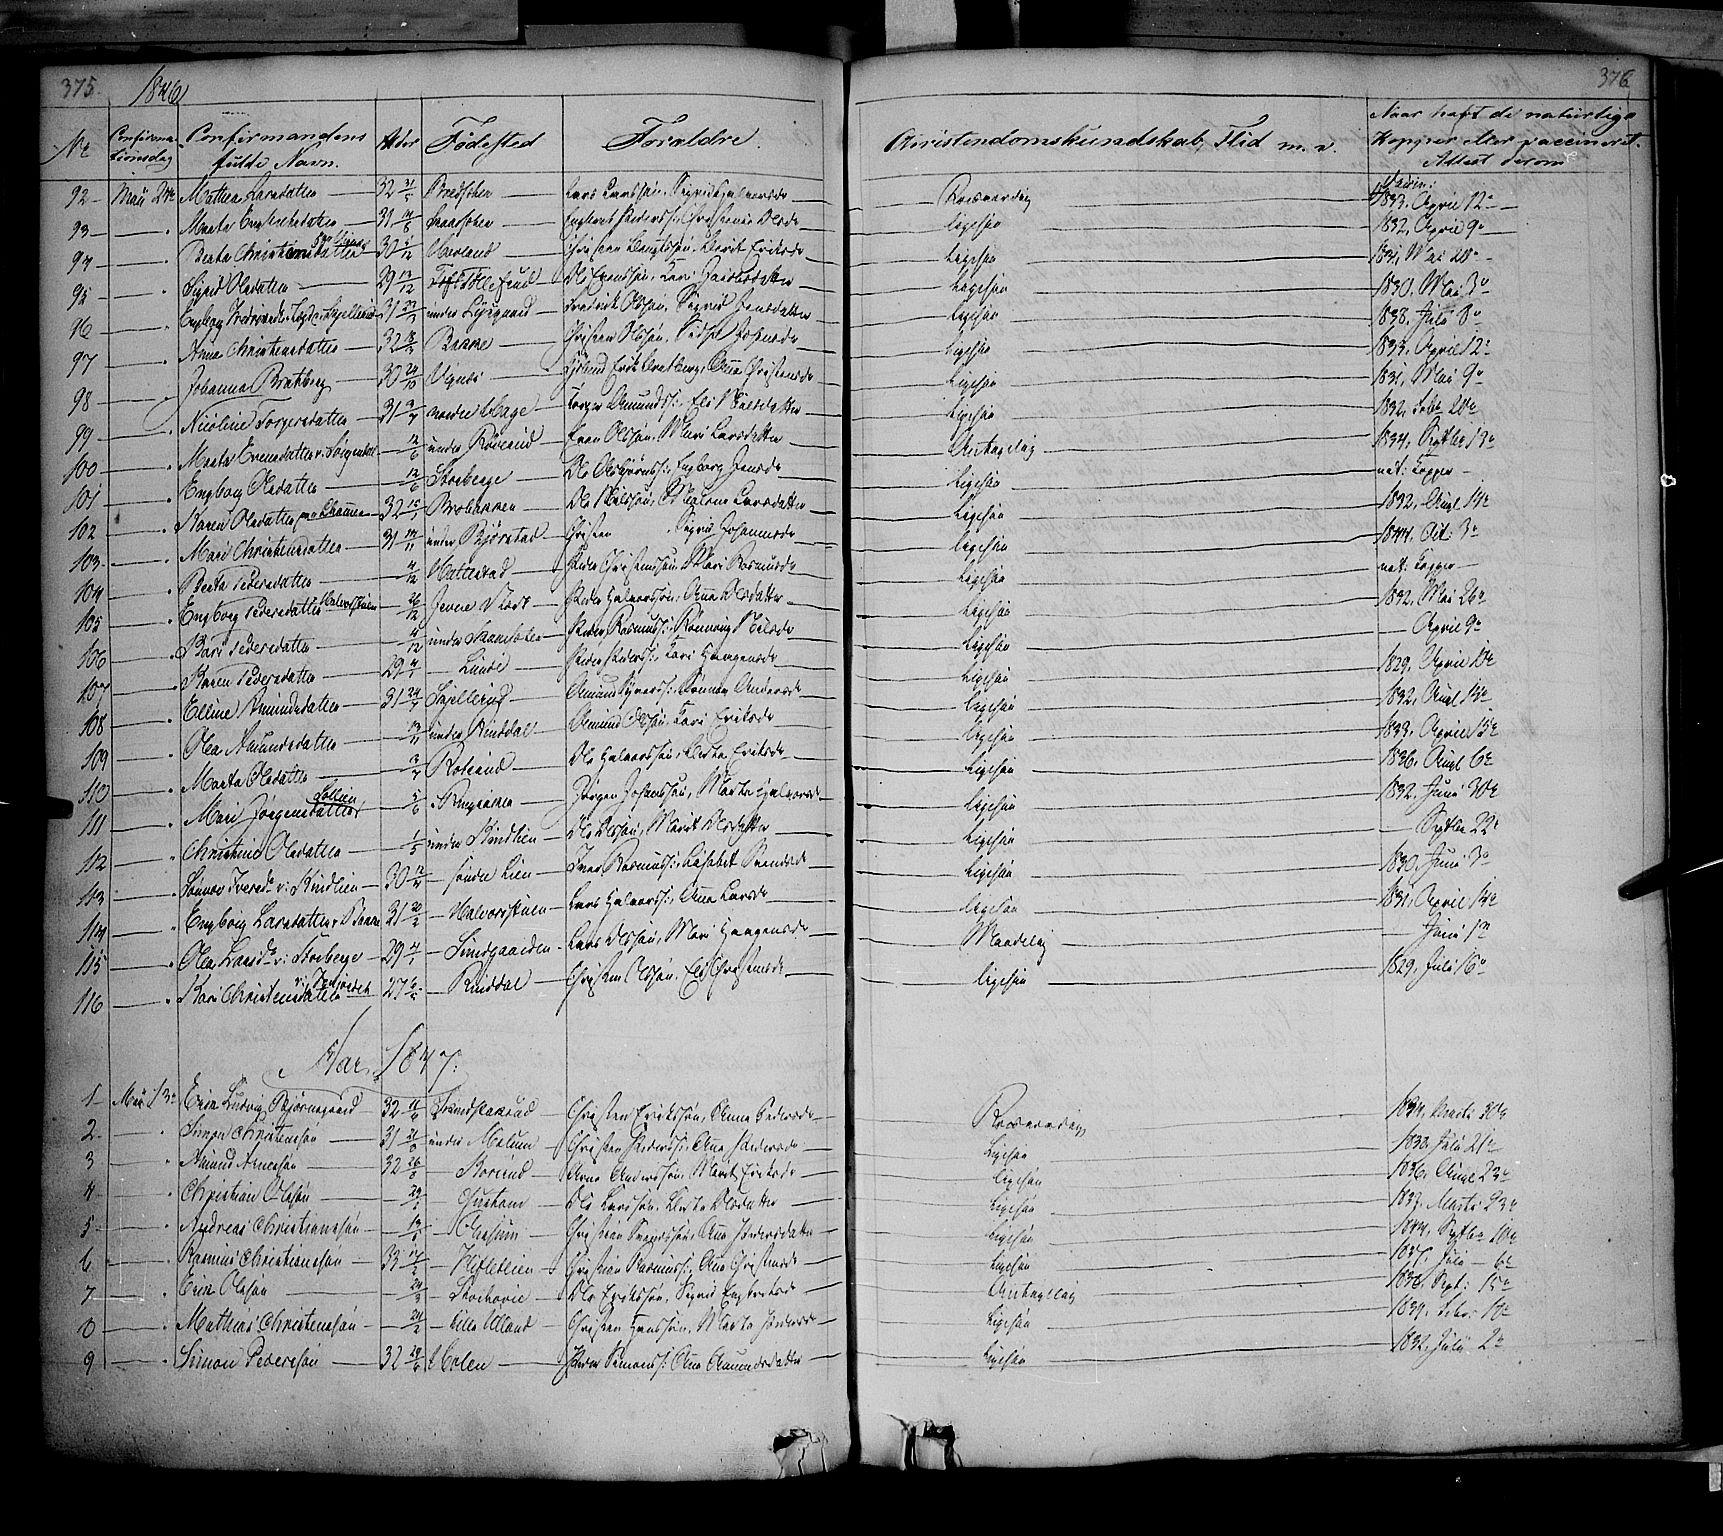 SAH, Fåberg prestekontor, Ministerialbok nr. 5, 1836-1854, s. 375-376